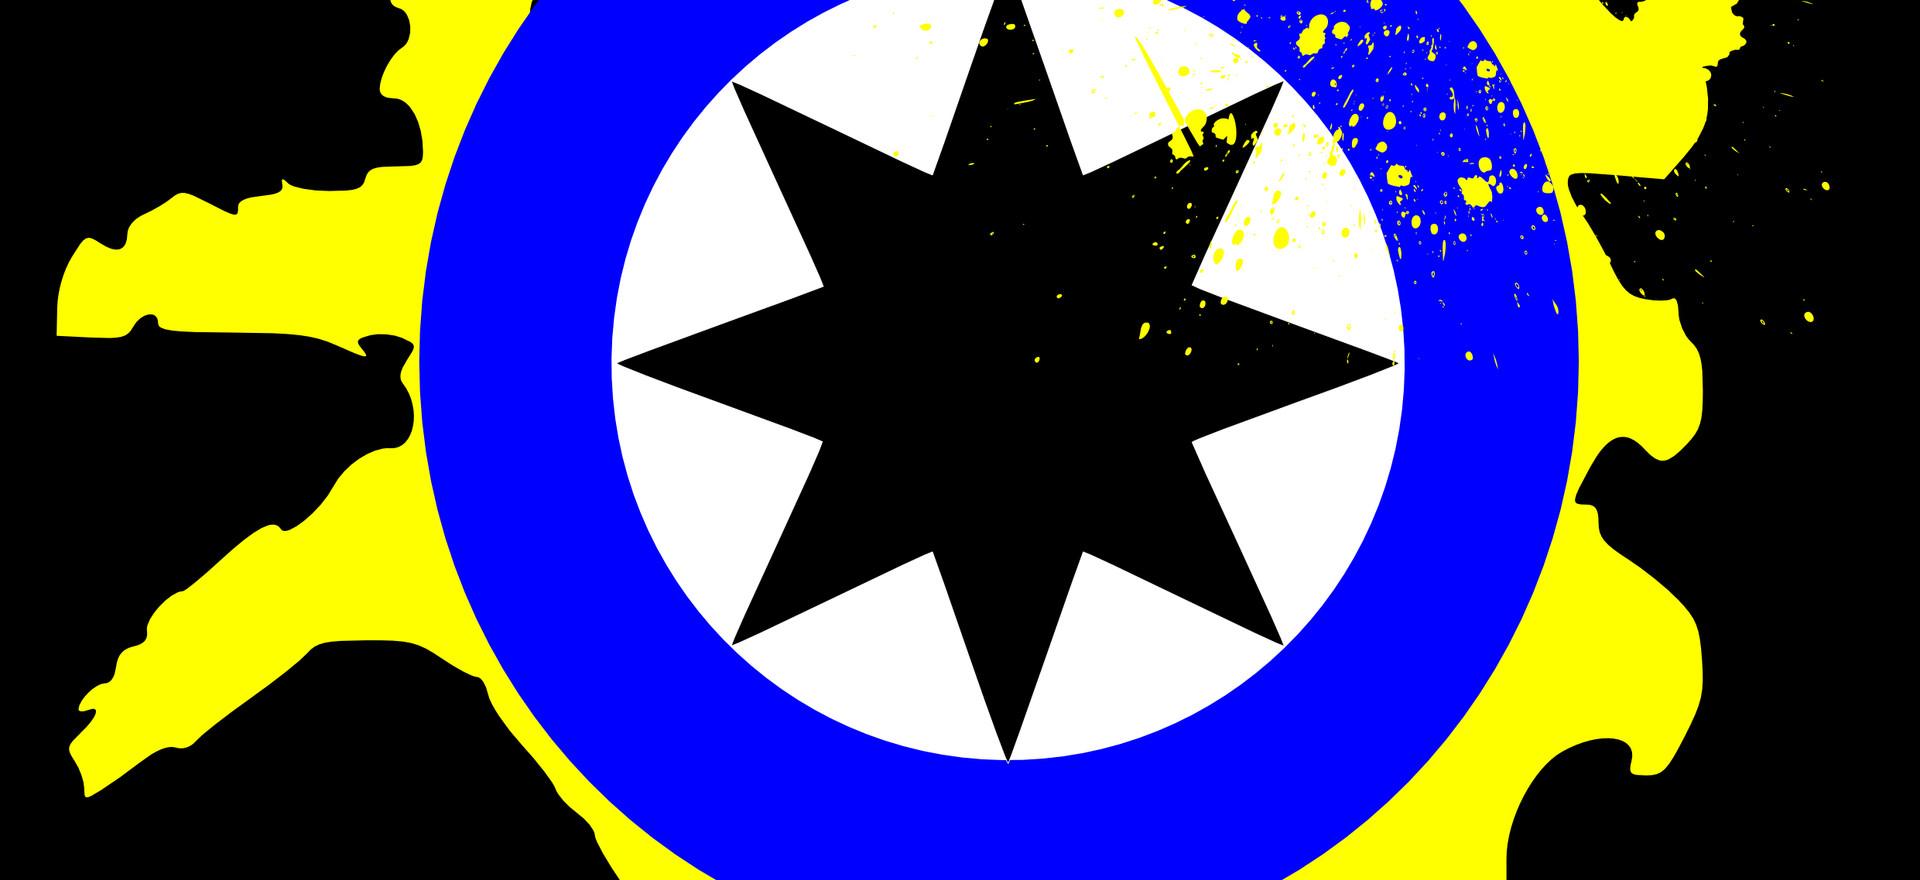 The Scream TARGET with star splats.jpg